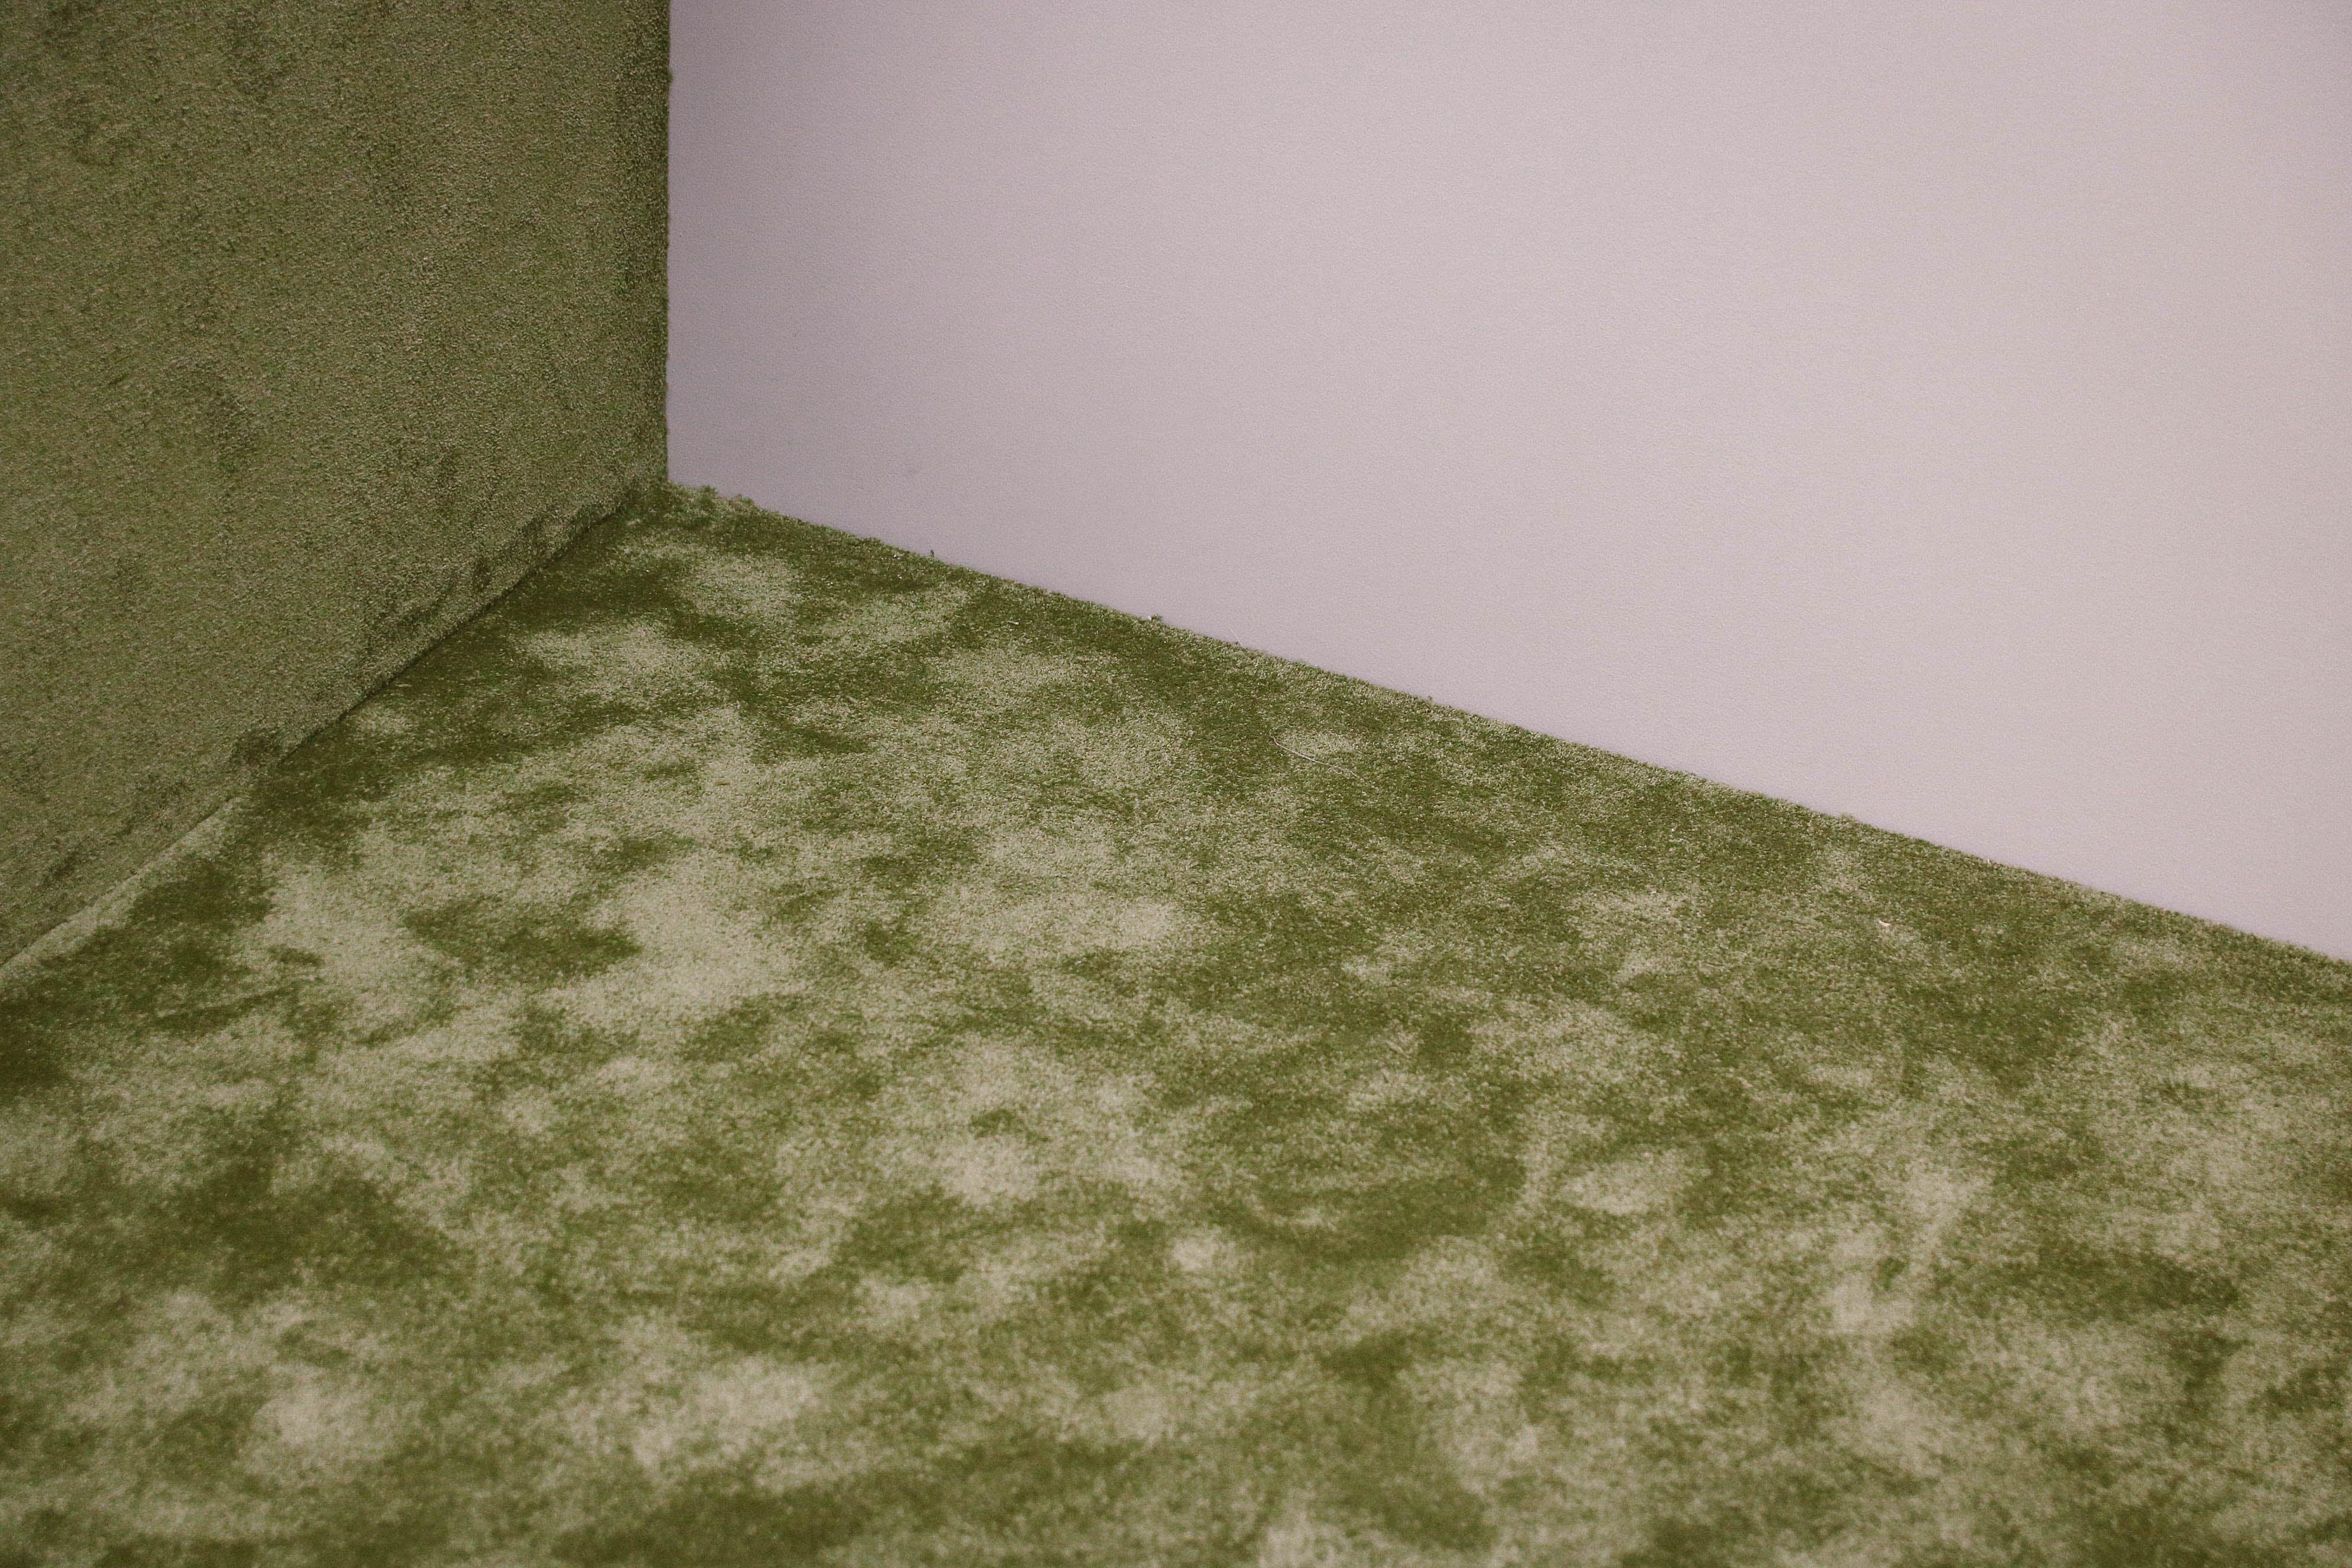 miimalistic, 地毯, 極簡主義, 牆壁 的 免費圖庫相片